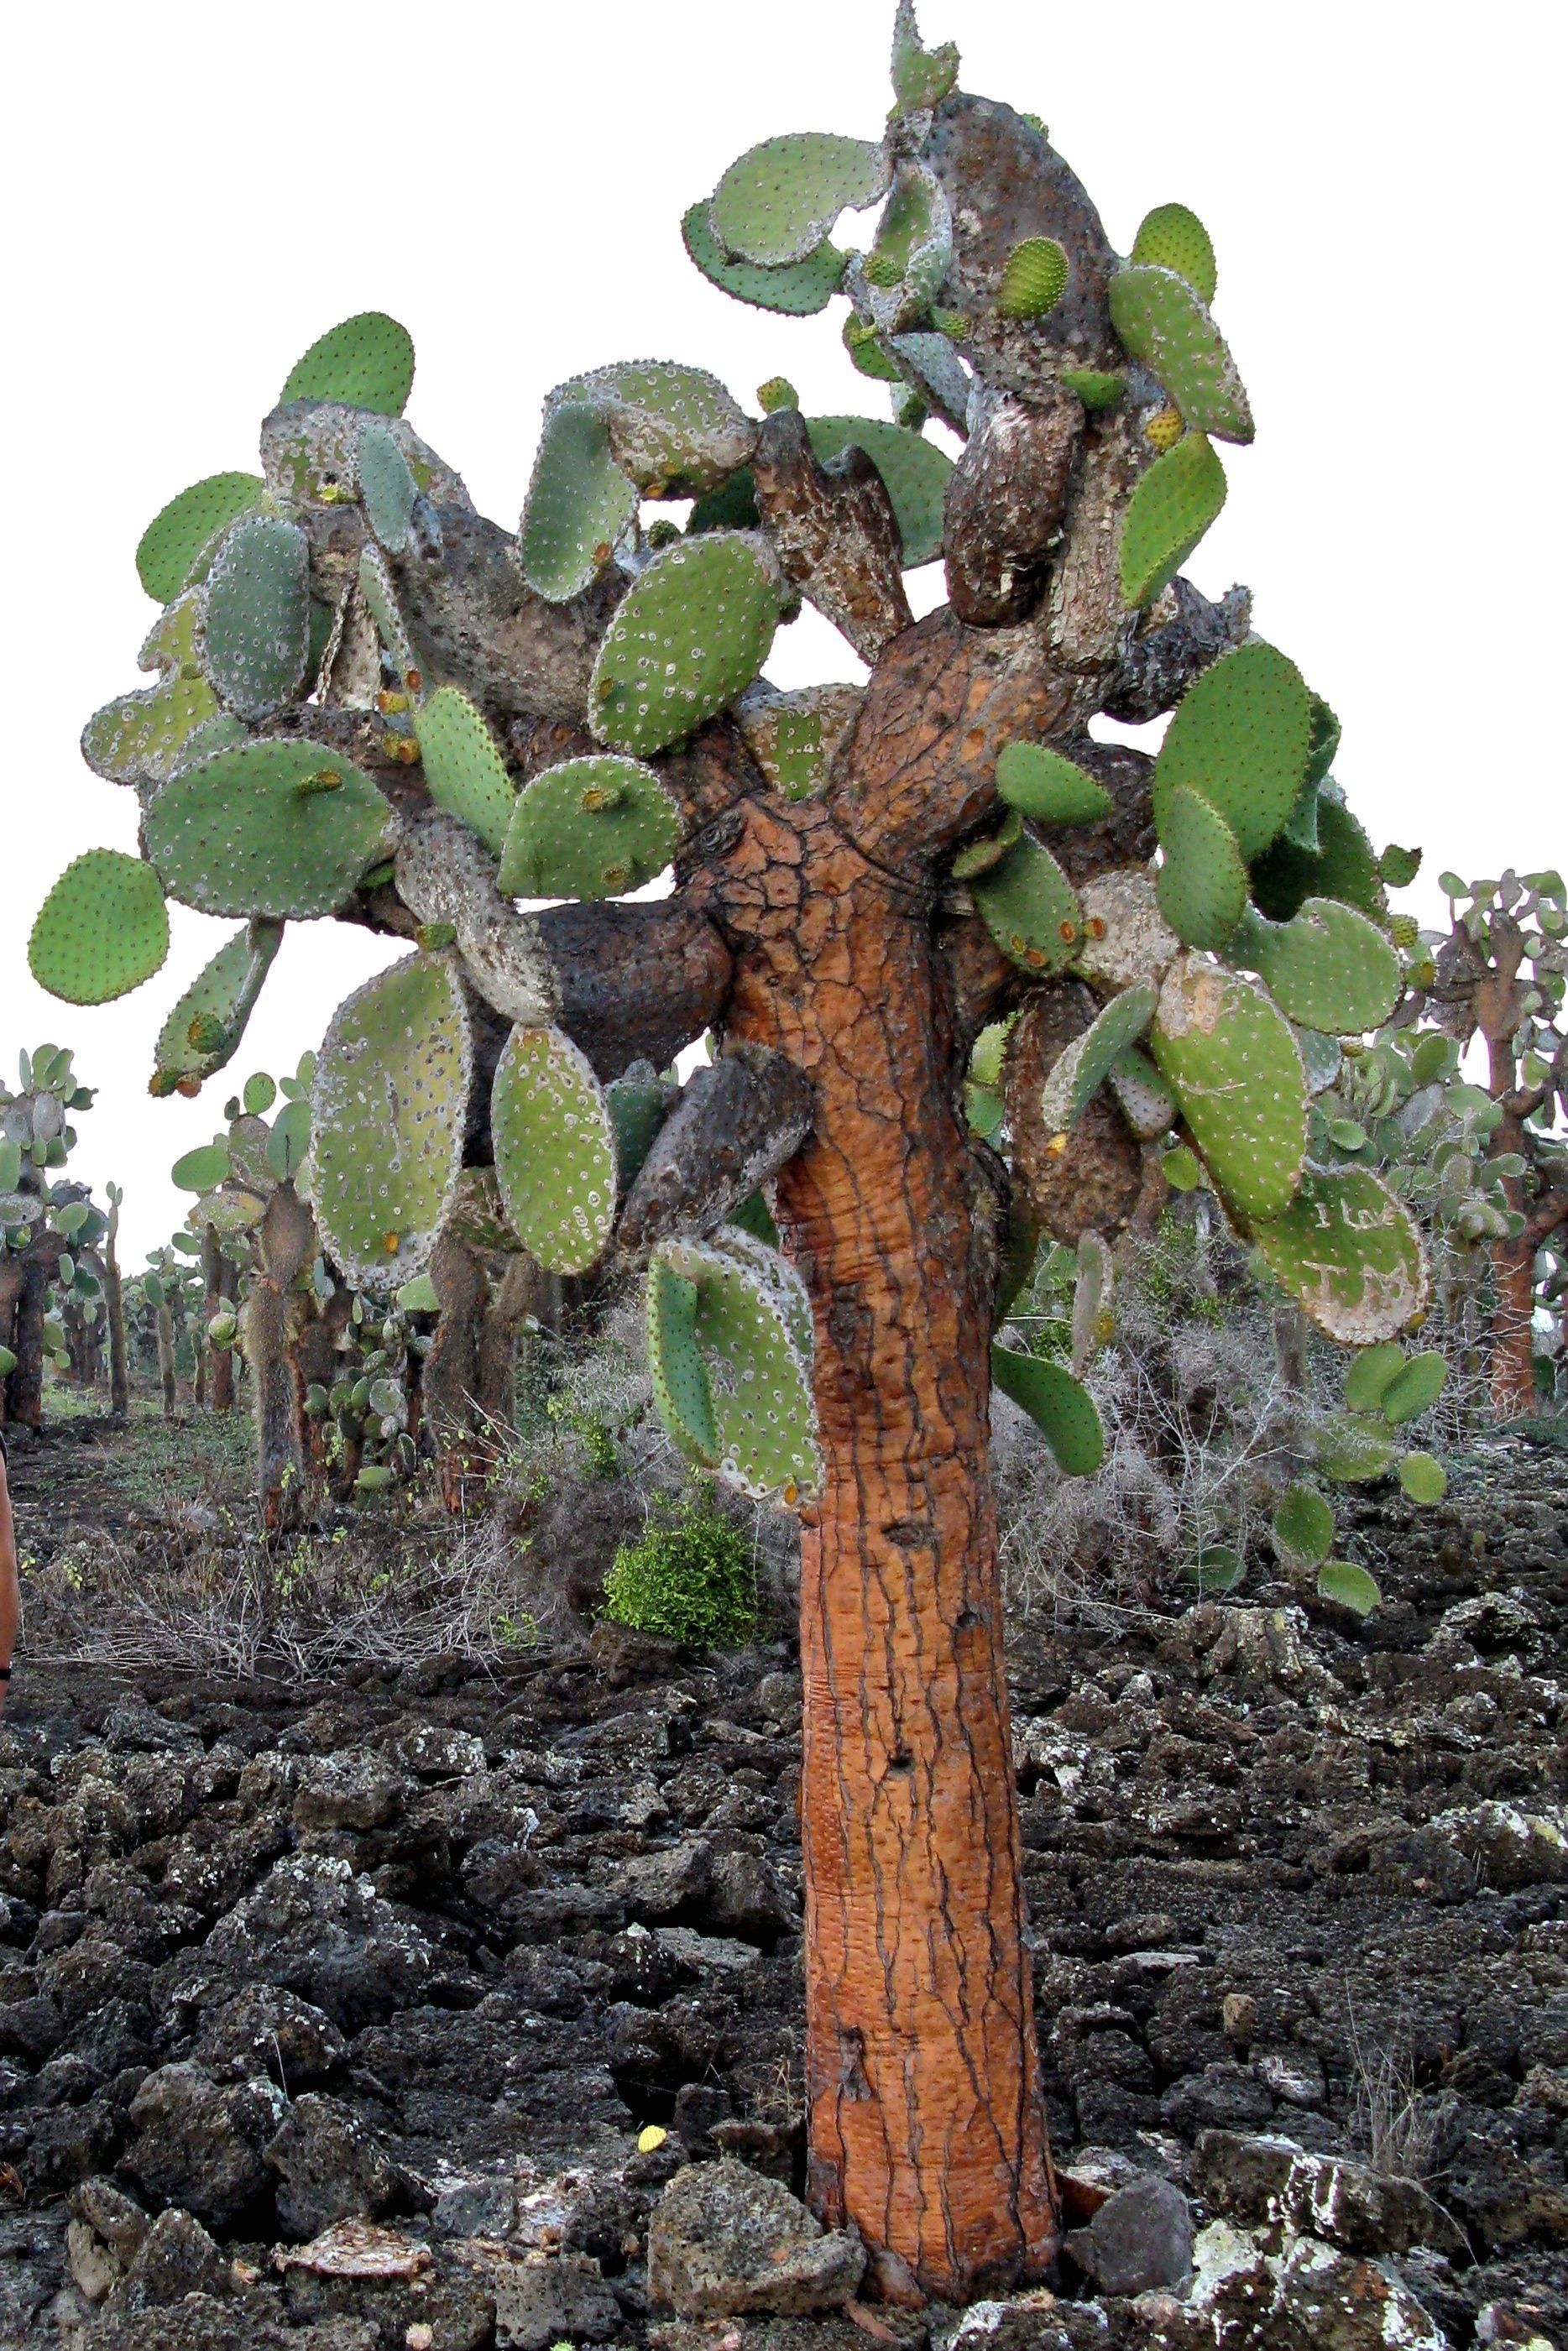 Cactus Opuntia Echios Galapagos Equdor Plants Rastline